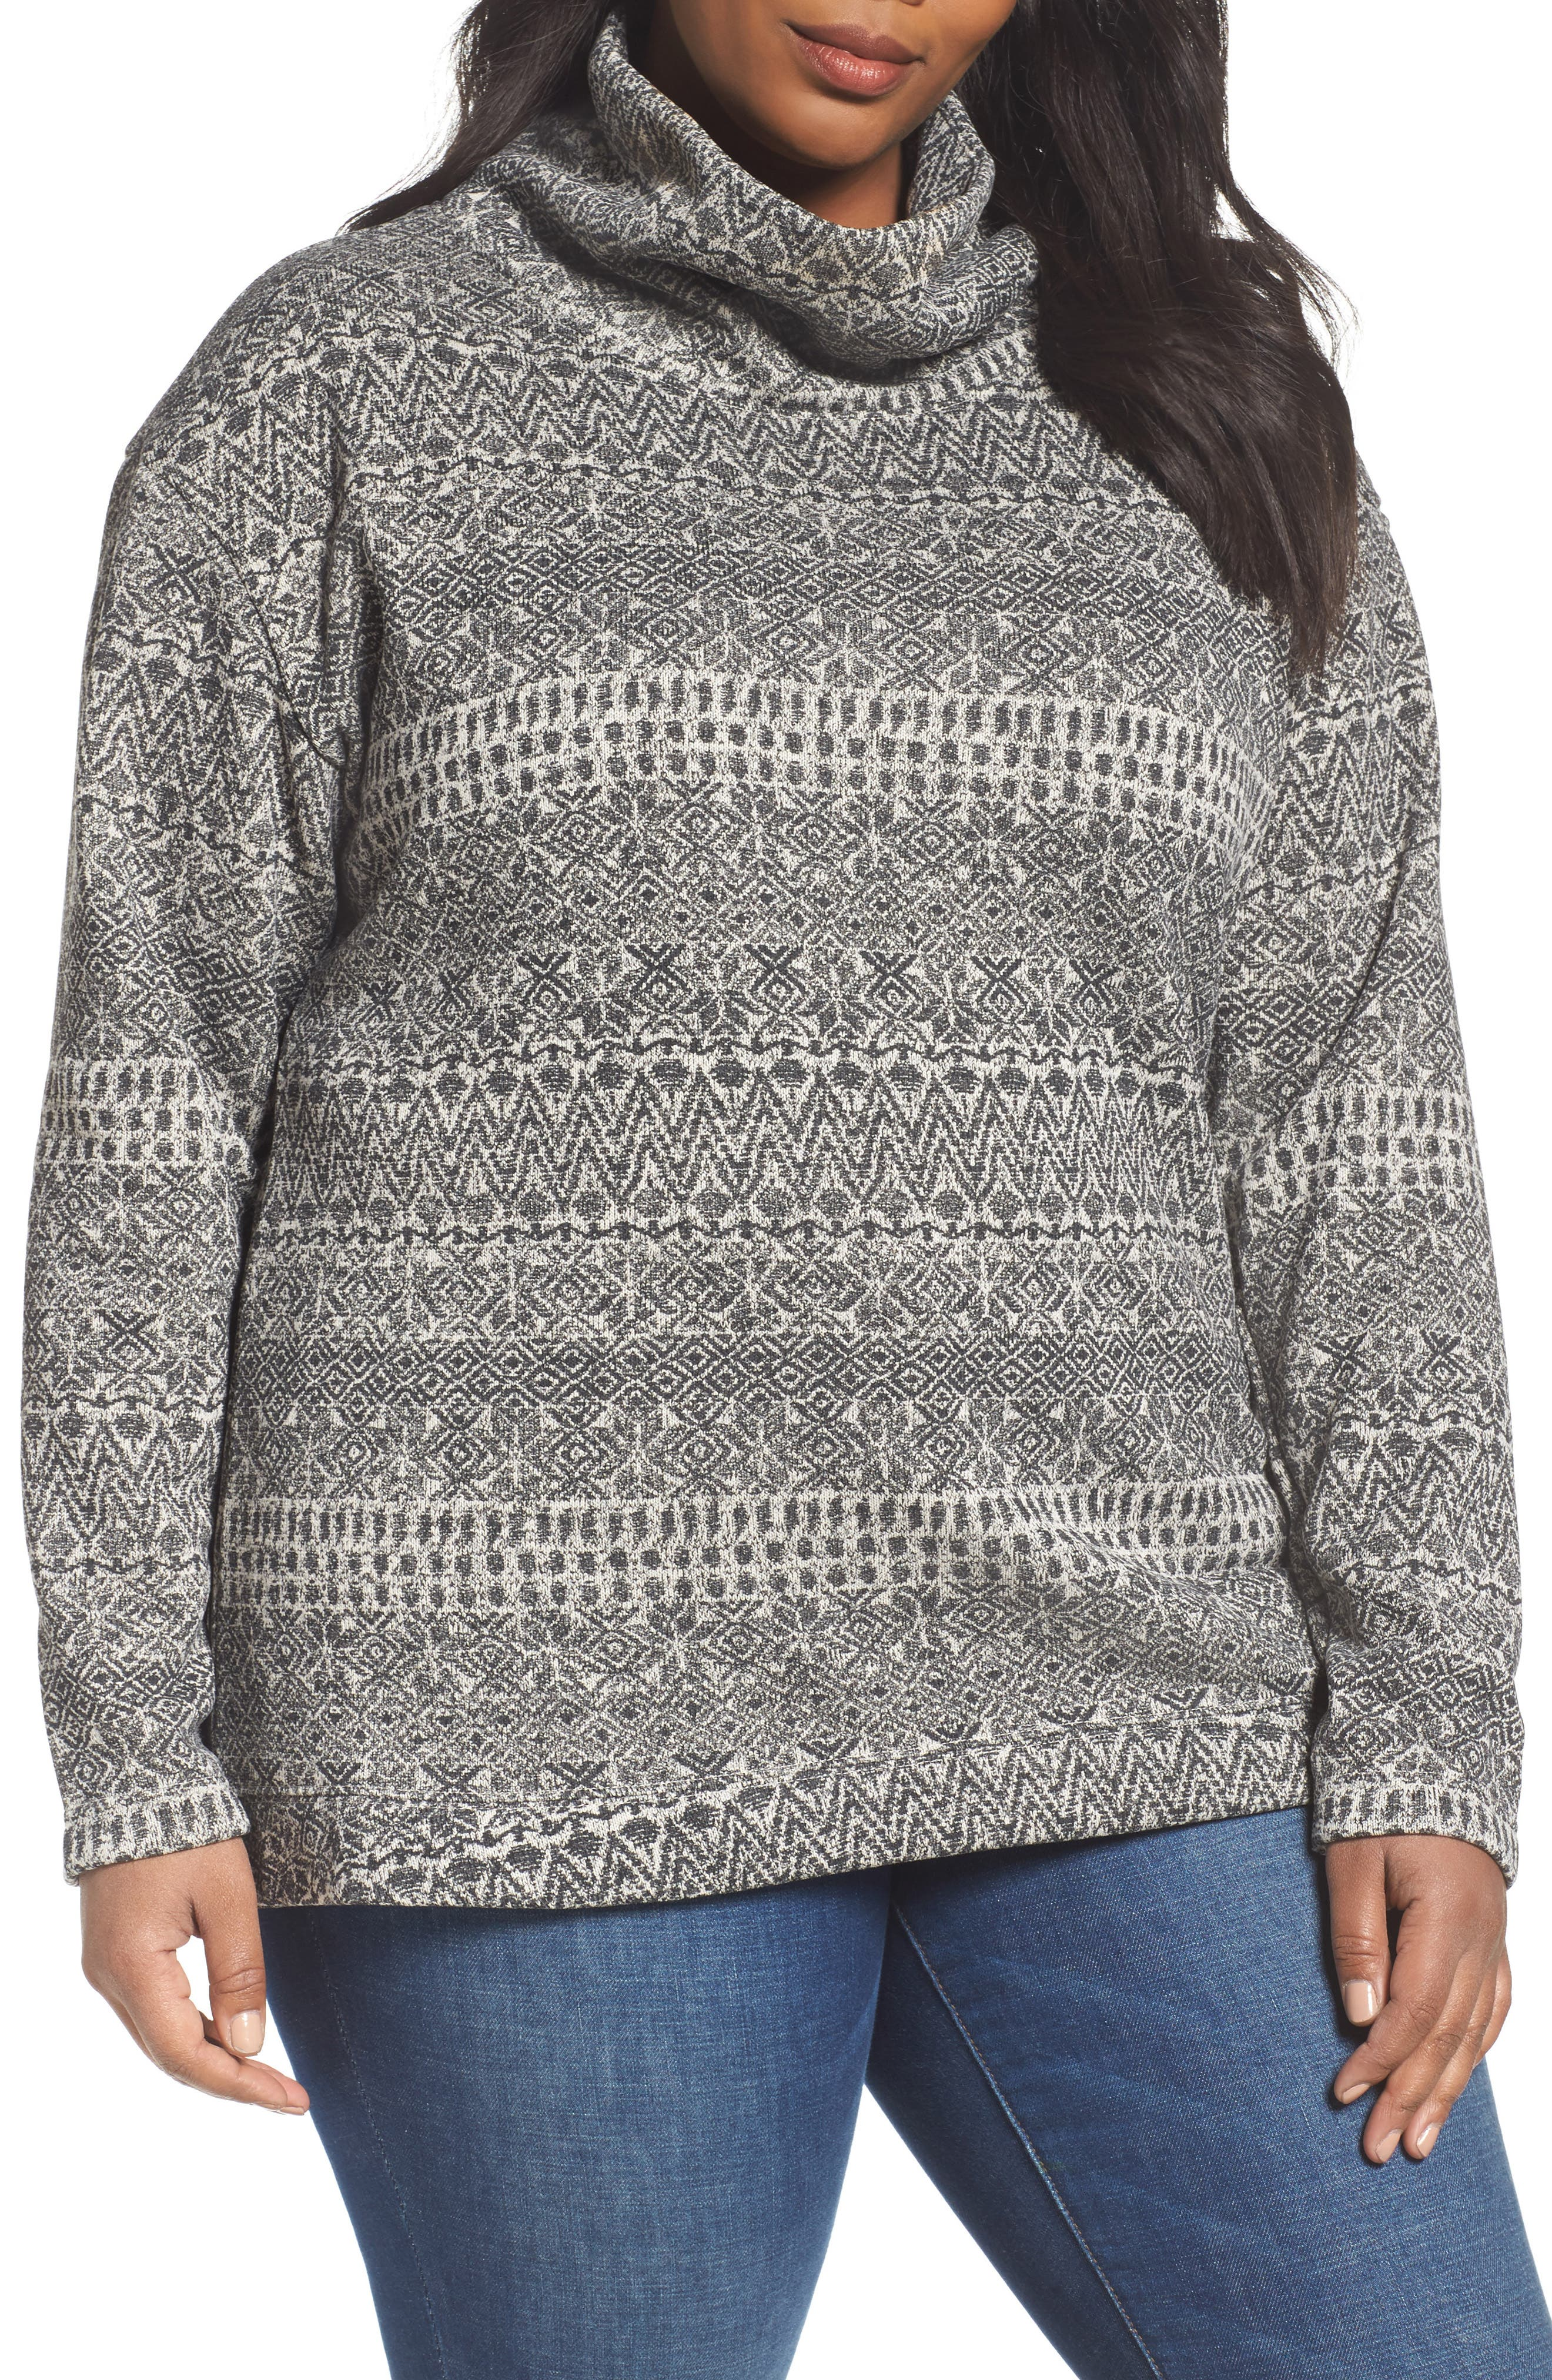 Columbia Sweater Season Pullover (Plus Size)